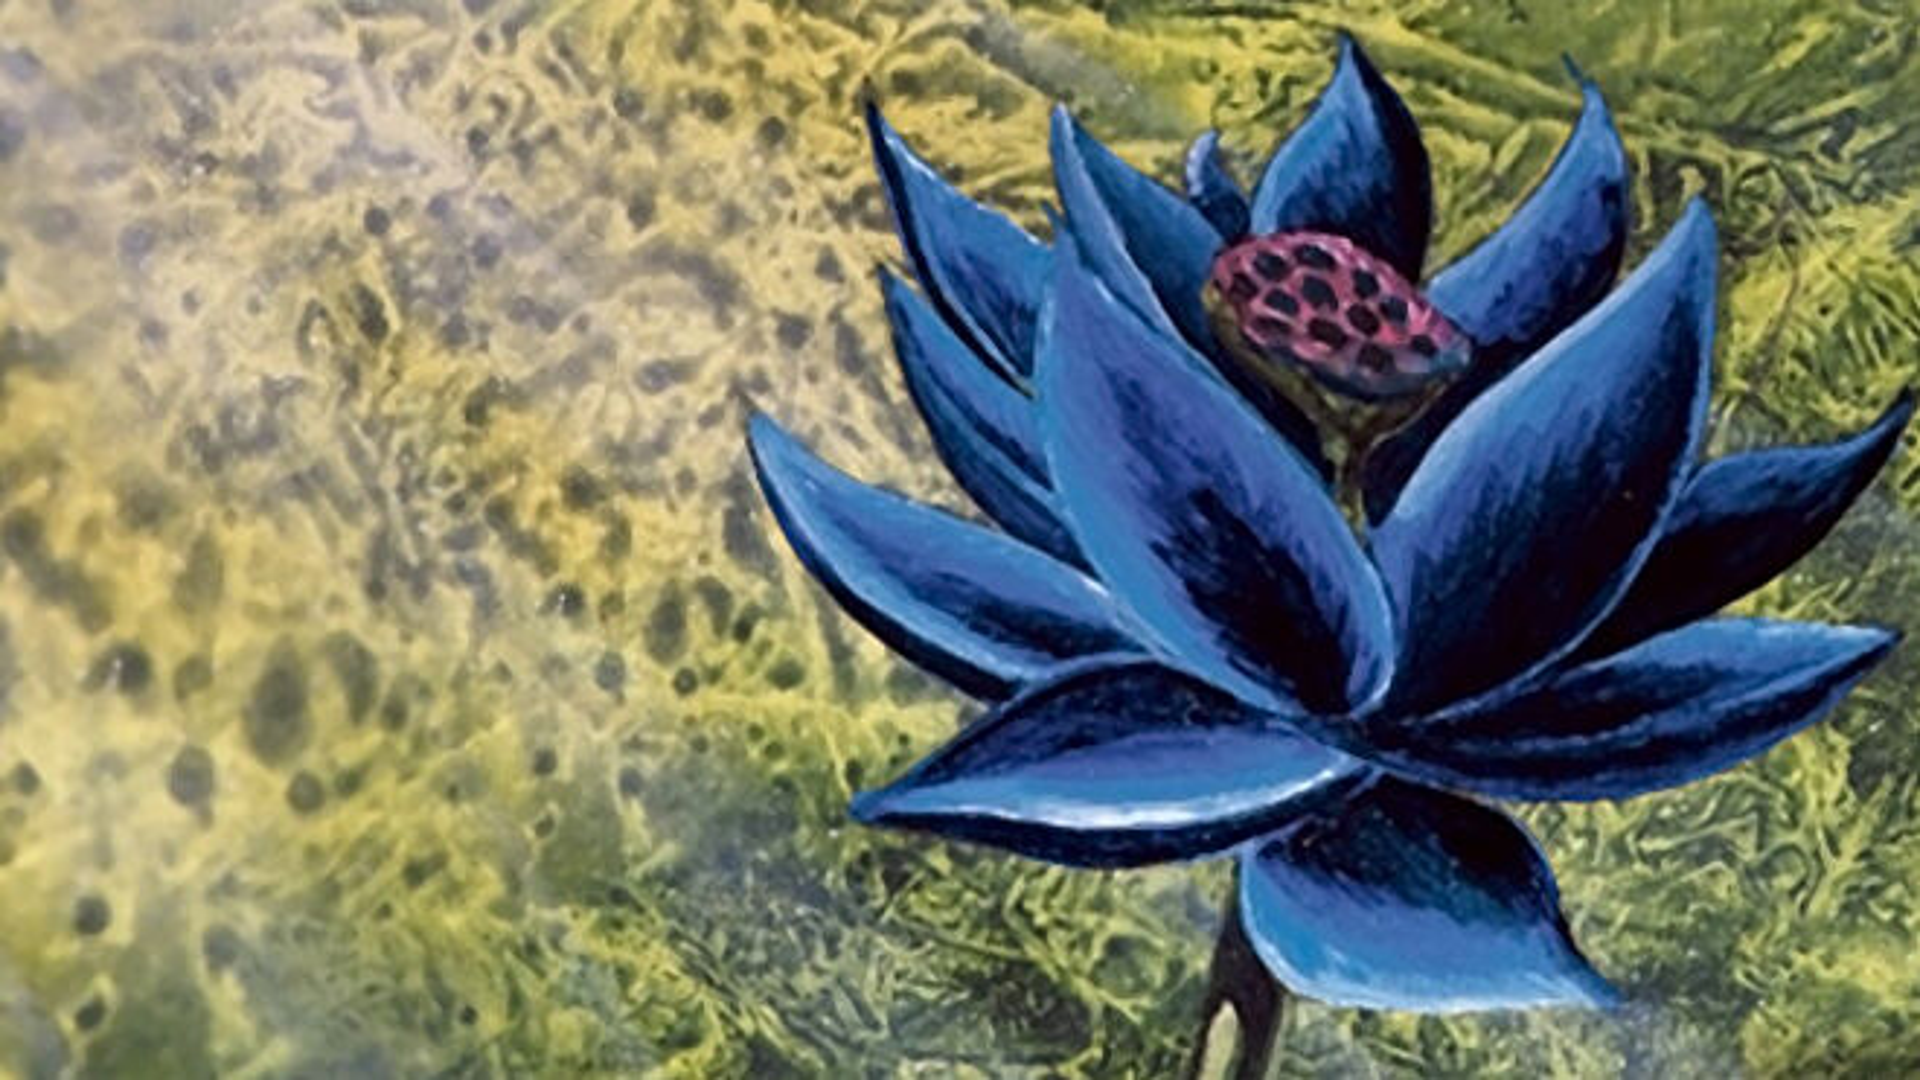 Magic: The Gathering Black Lotus card artwork